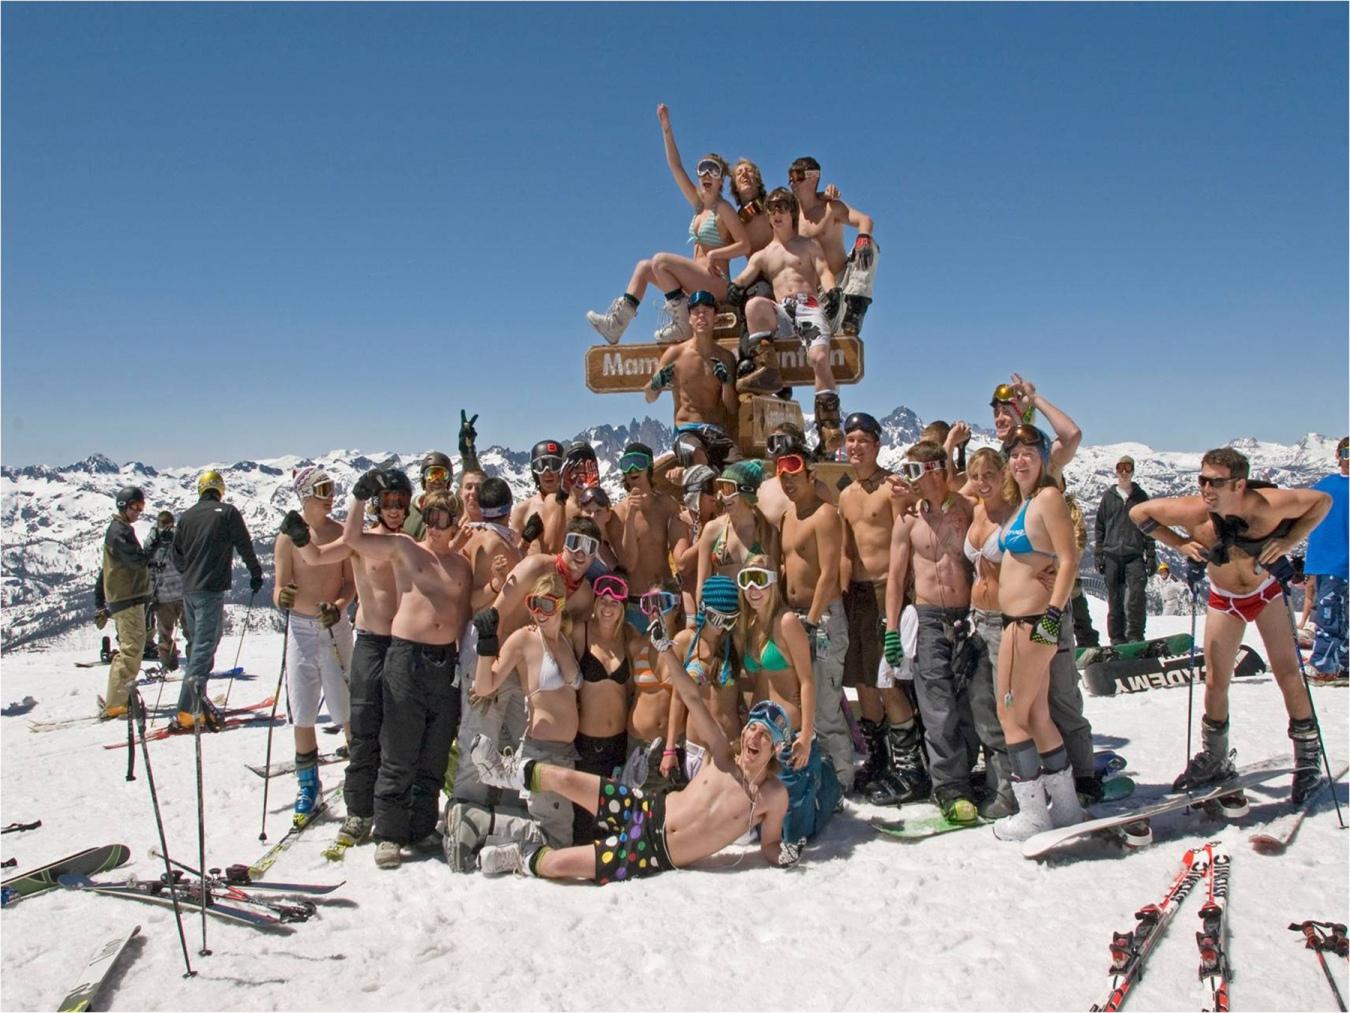 82865-SNOW-BEACH_klein.jpg